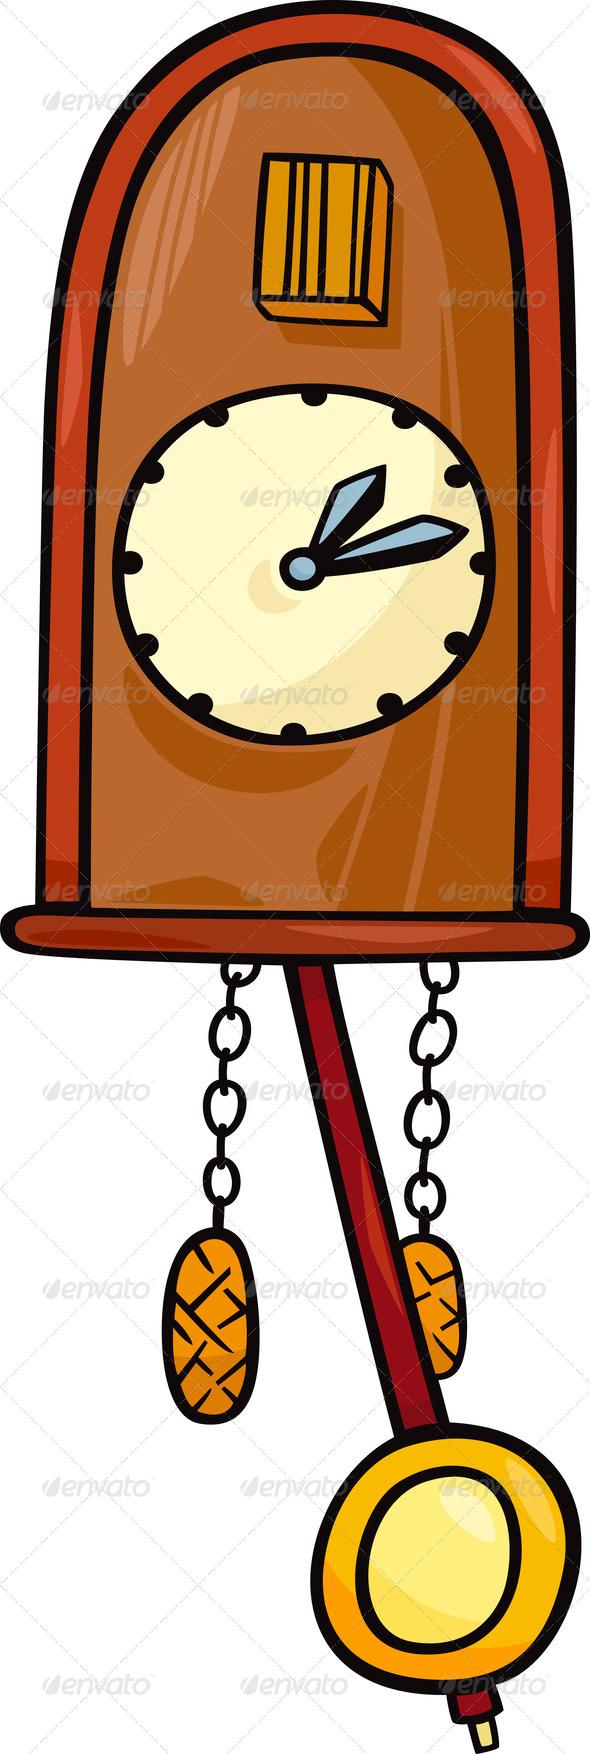 Christmas Cuckoo Clock